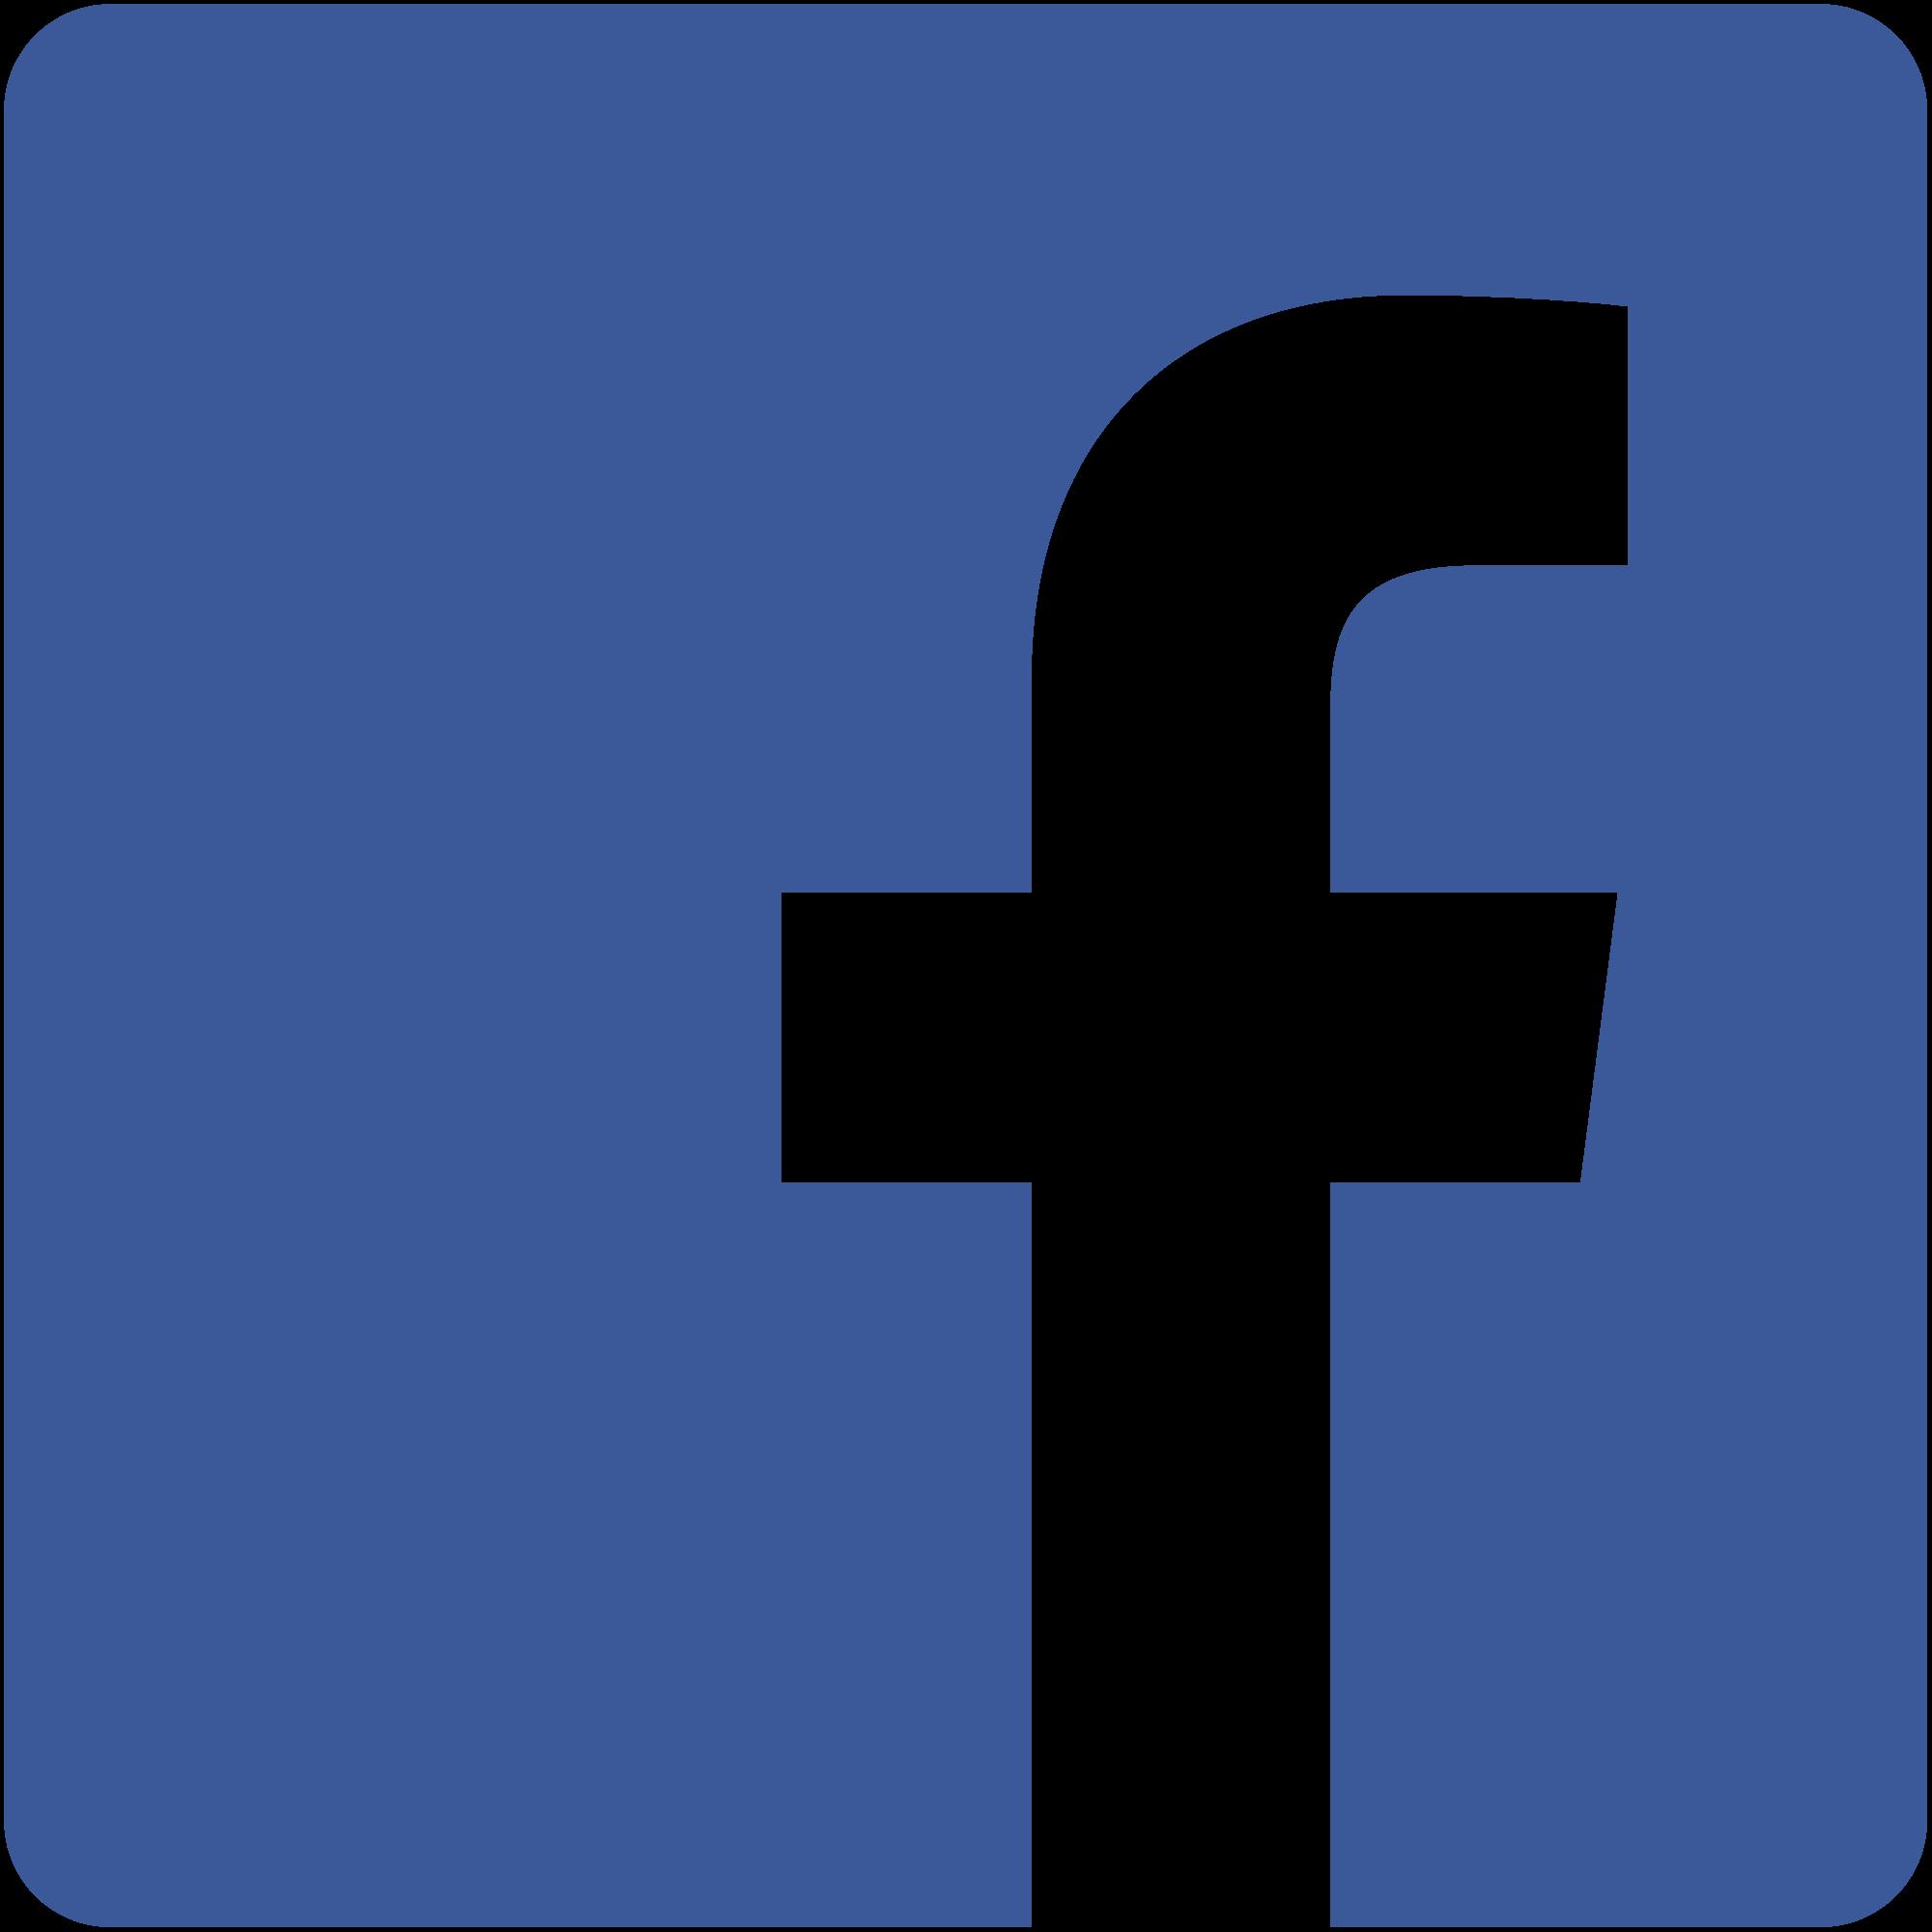 Facebook clipart icon transparent picture free download Facebook icon transparent background clipart images gallery for free ... picture free download